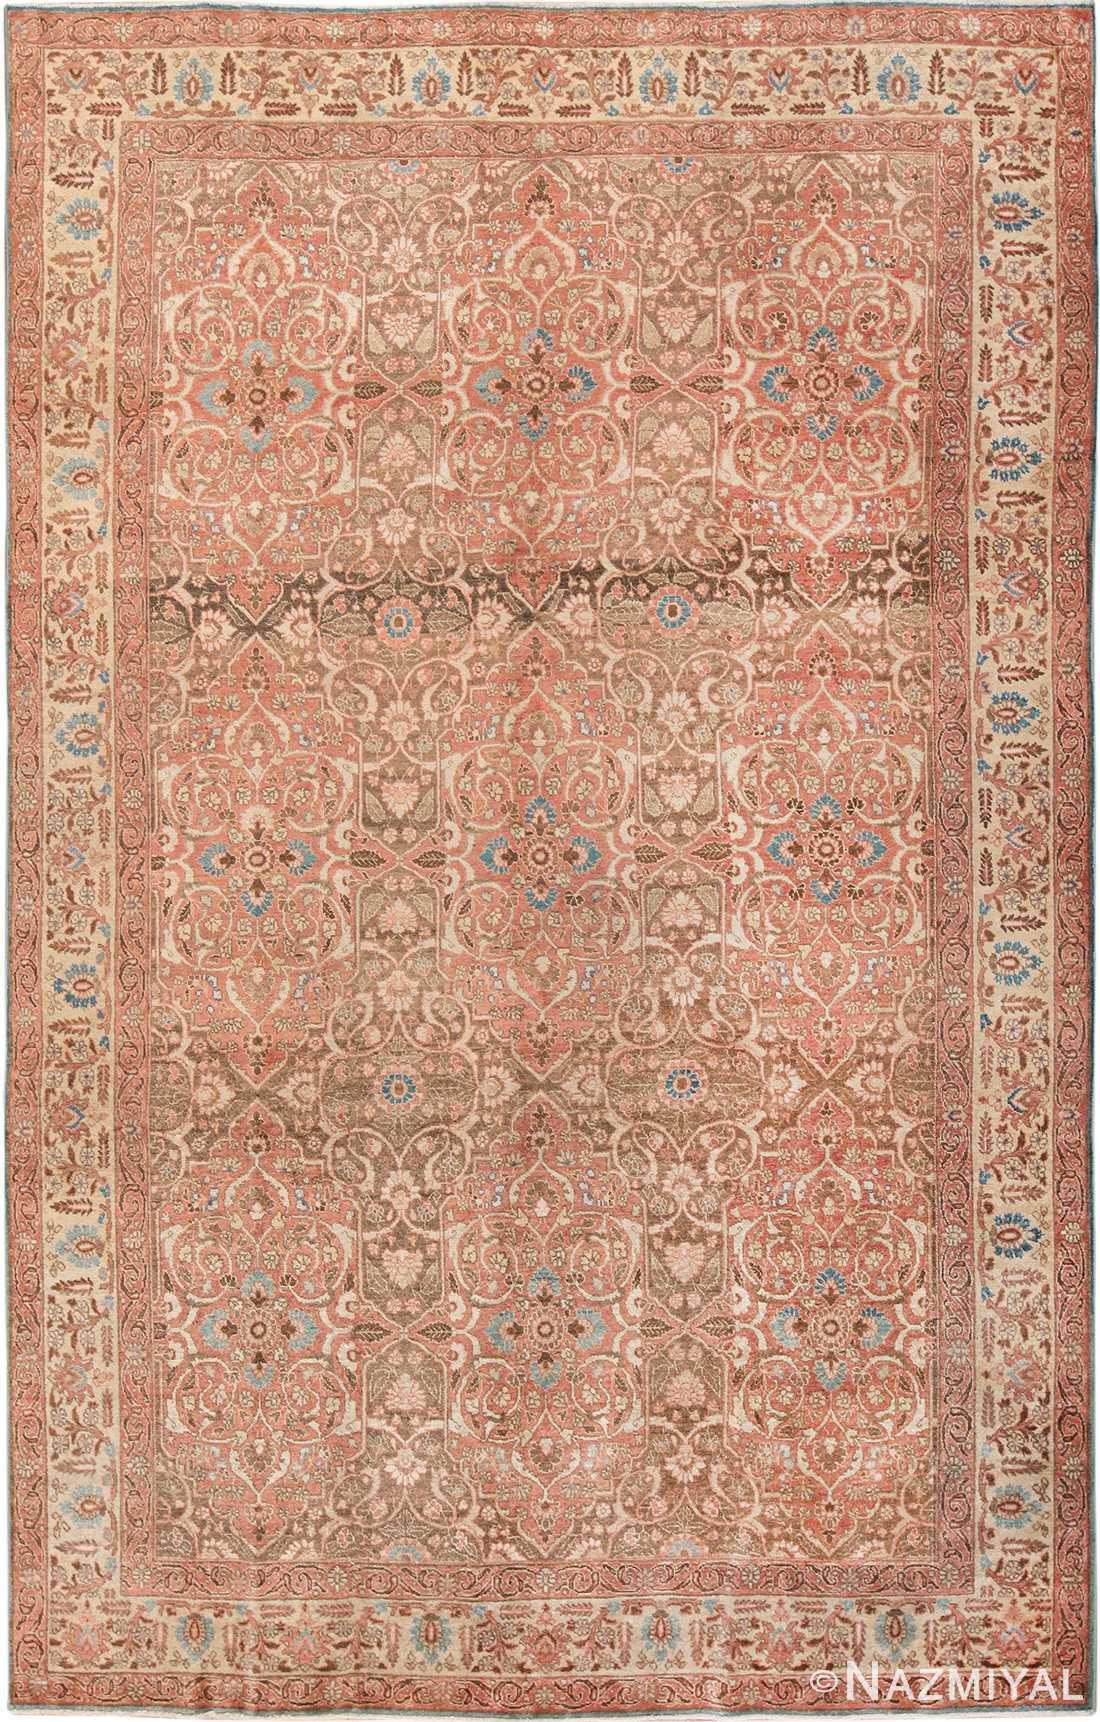 antique persian floral tabriz rug 50363 Nazmiyal